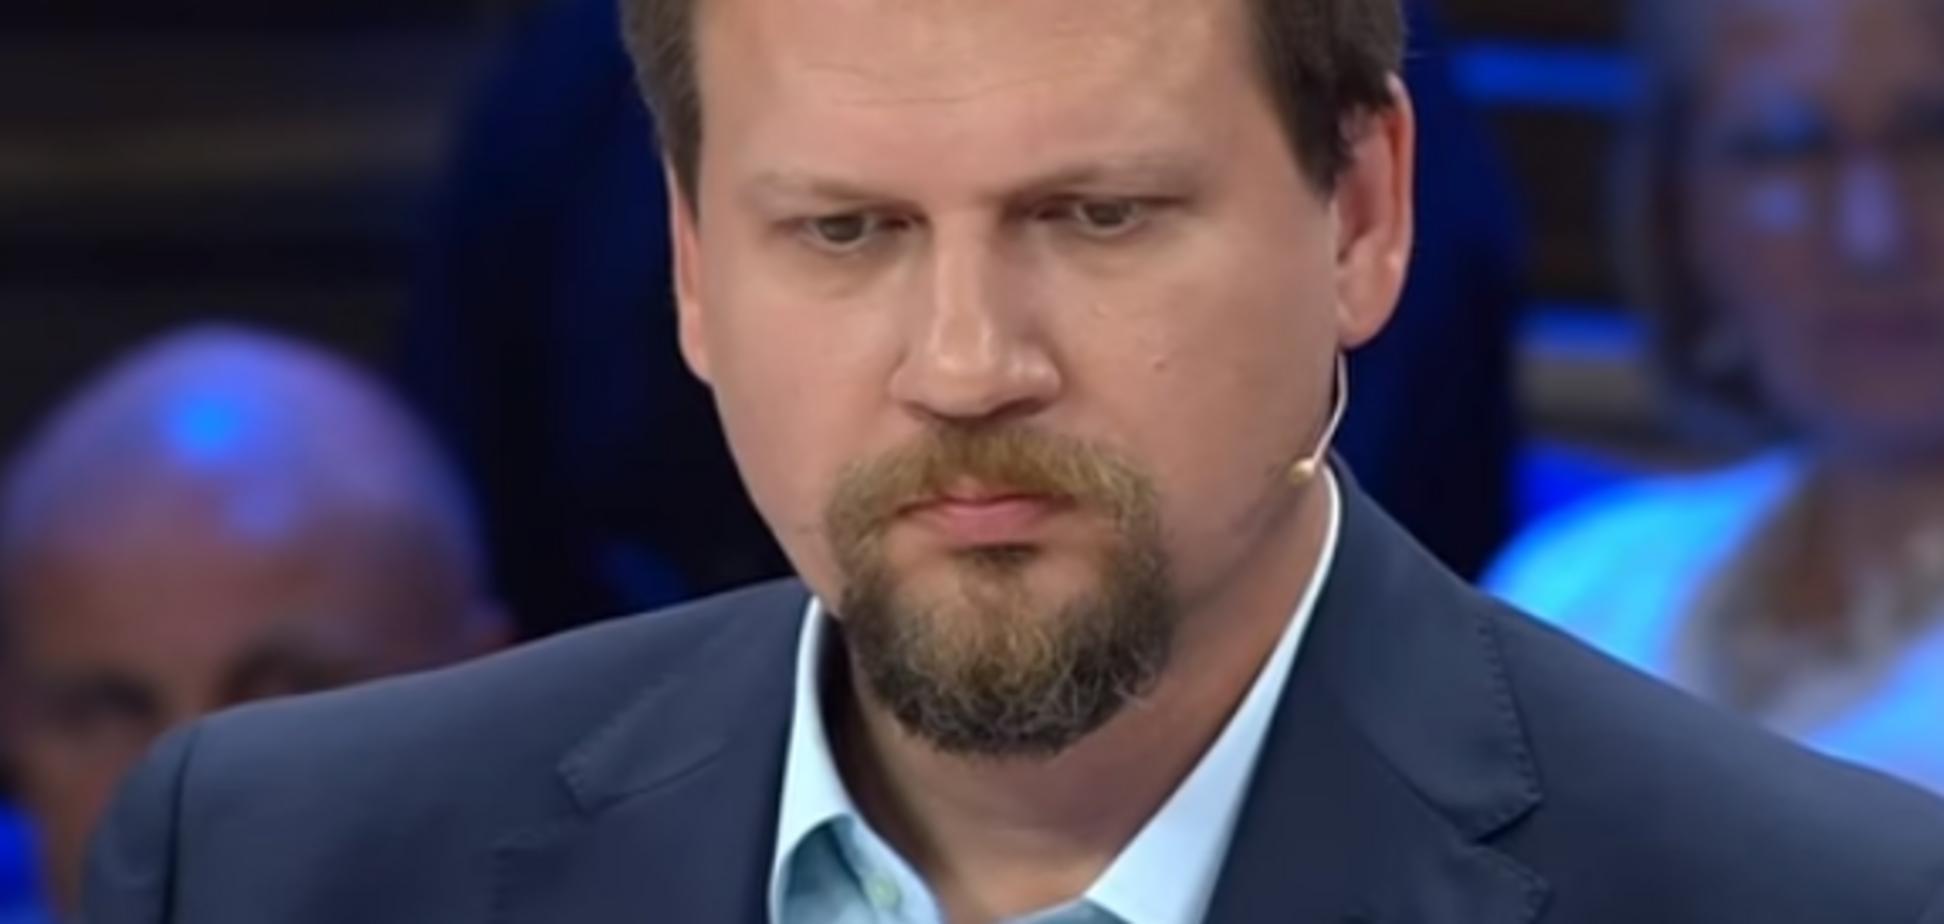 ''Не слышу у вас разум'': дипломат США поставил на место голос ''антимайдана''